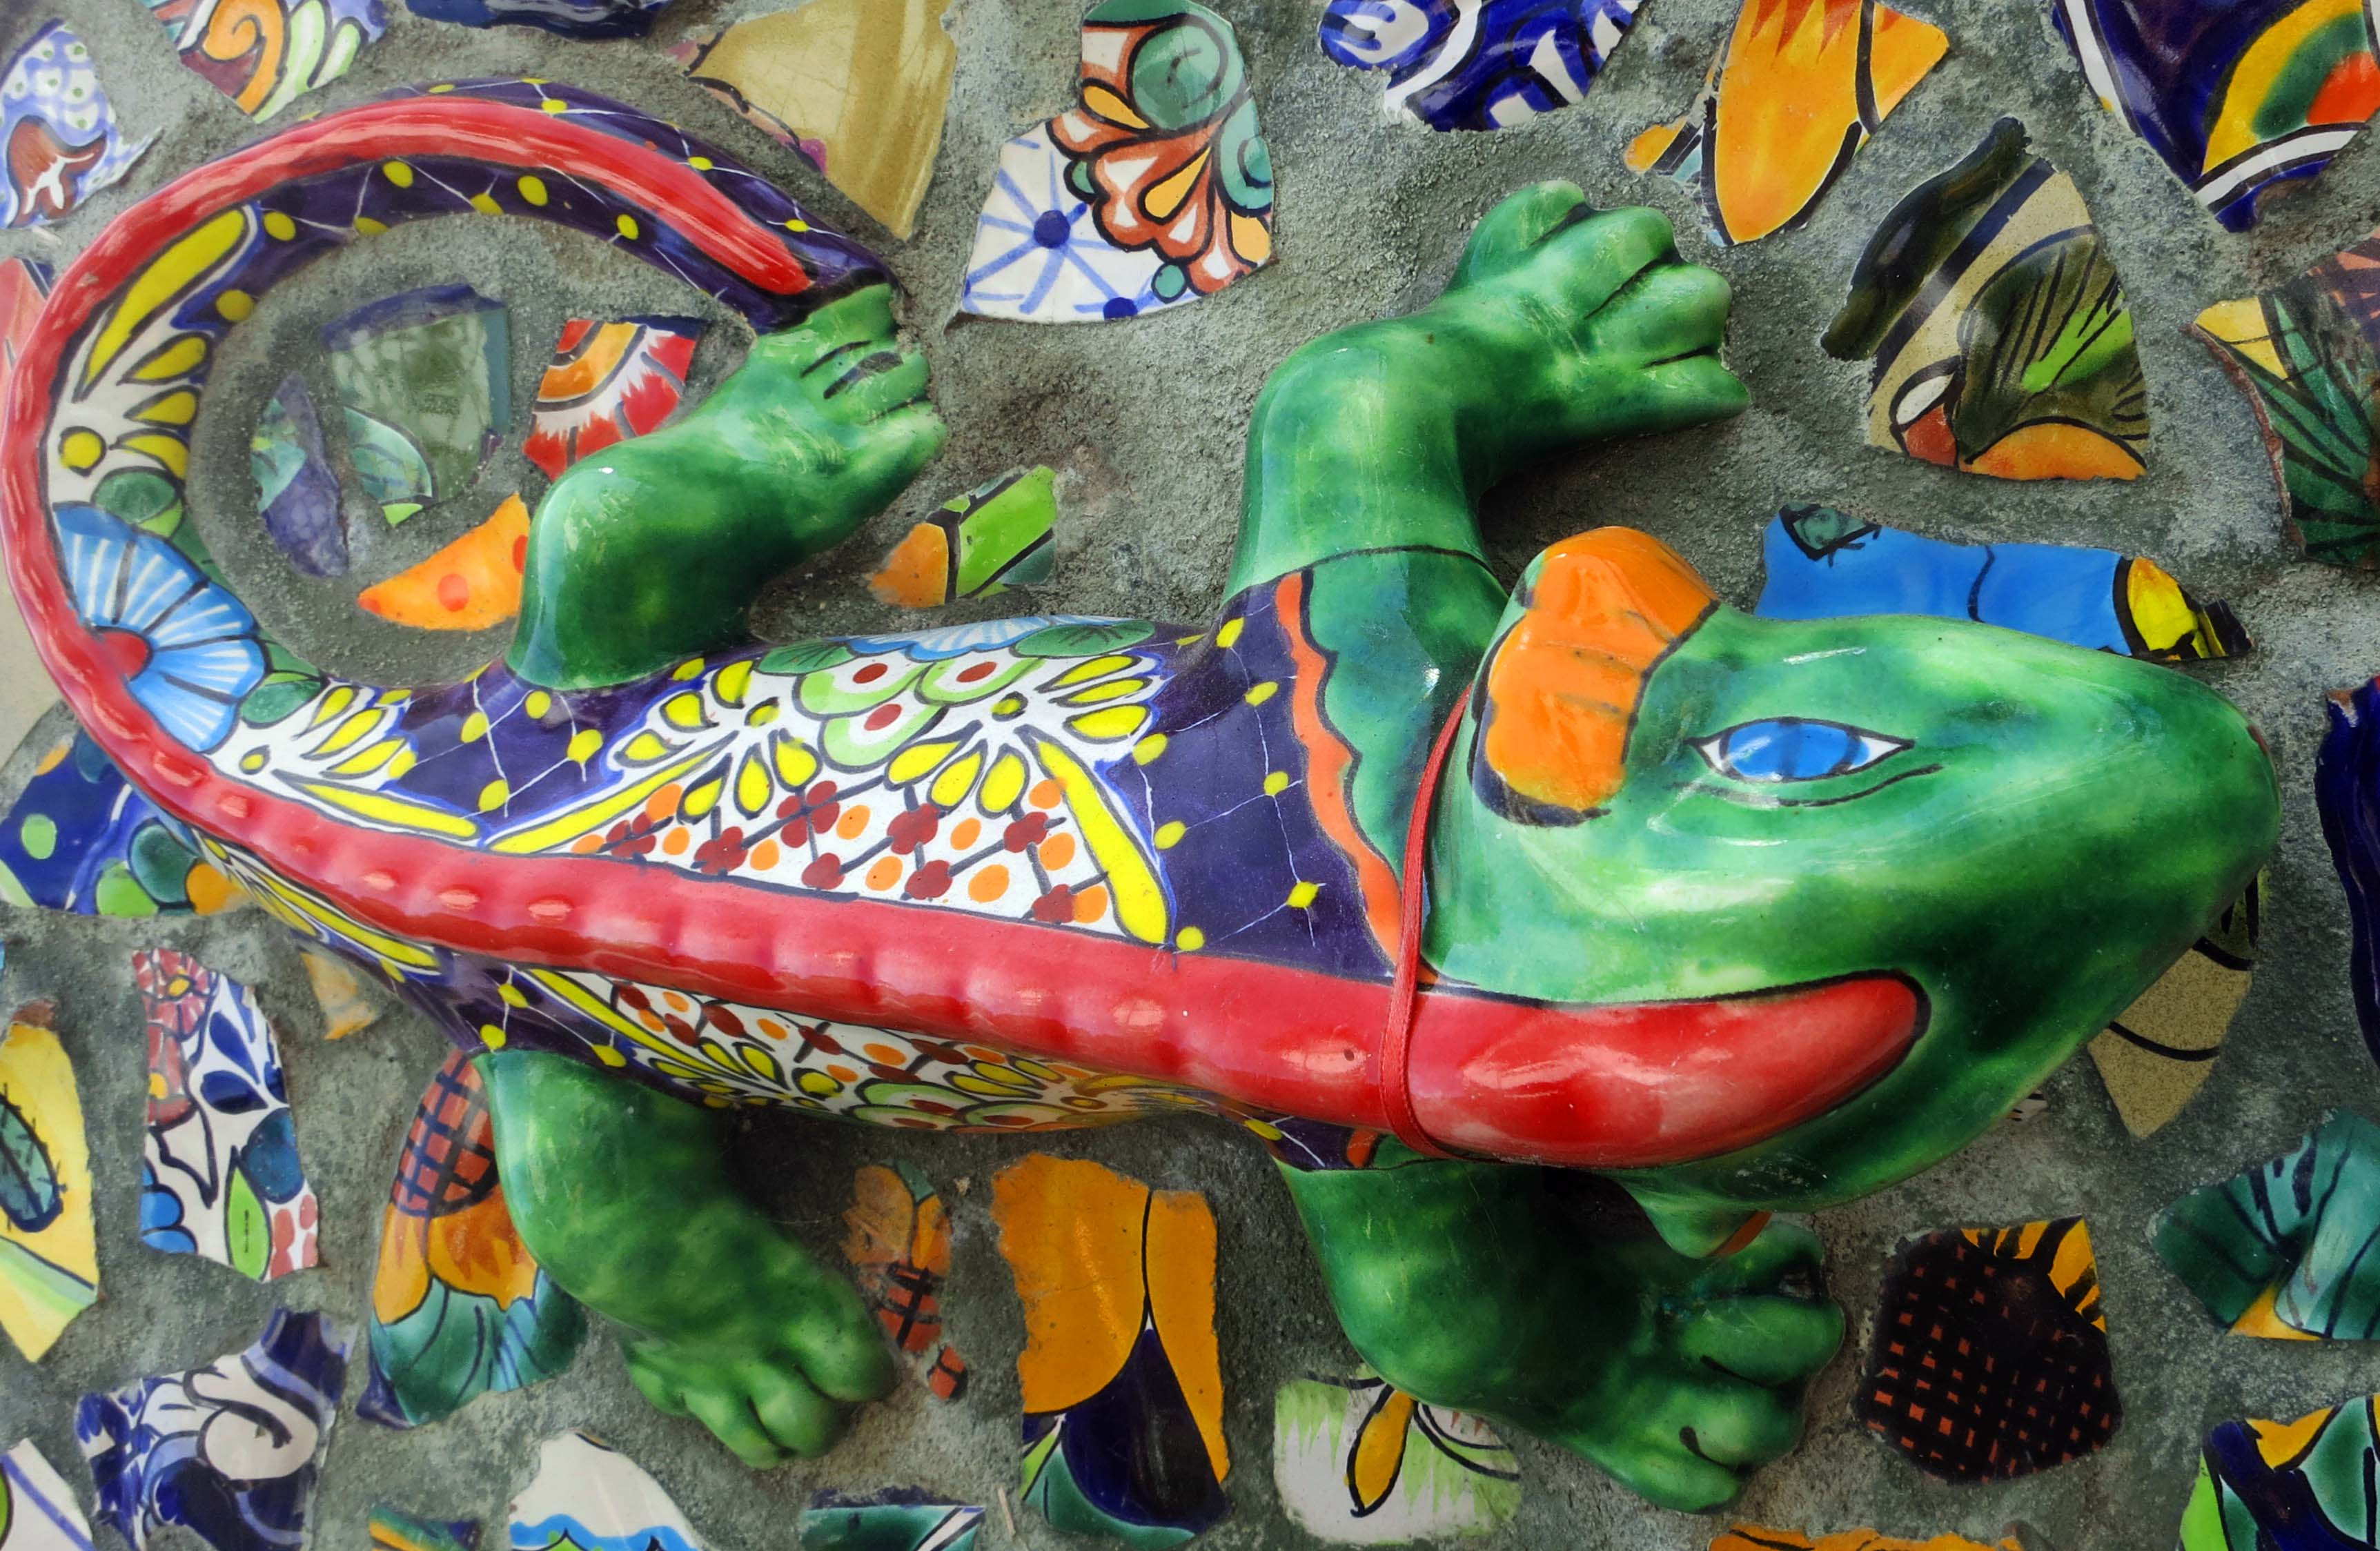 Puerto Vallarta mural featuring iguana. Photo by Curtis Mekemson.